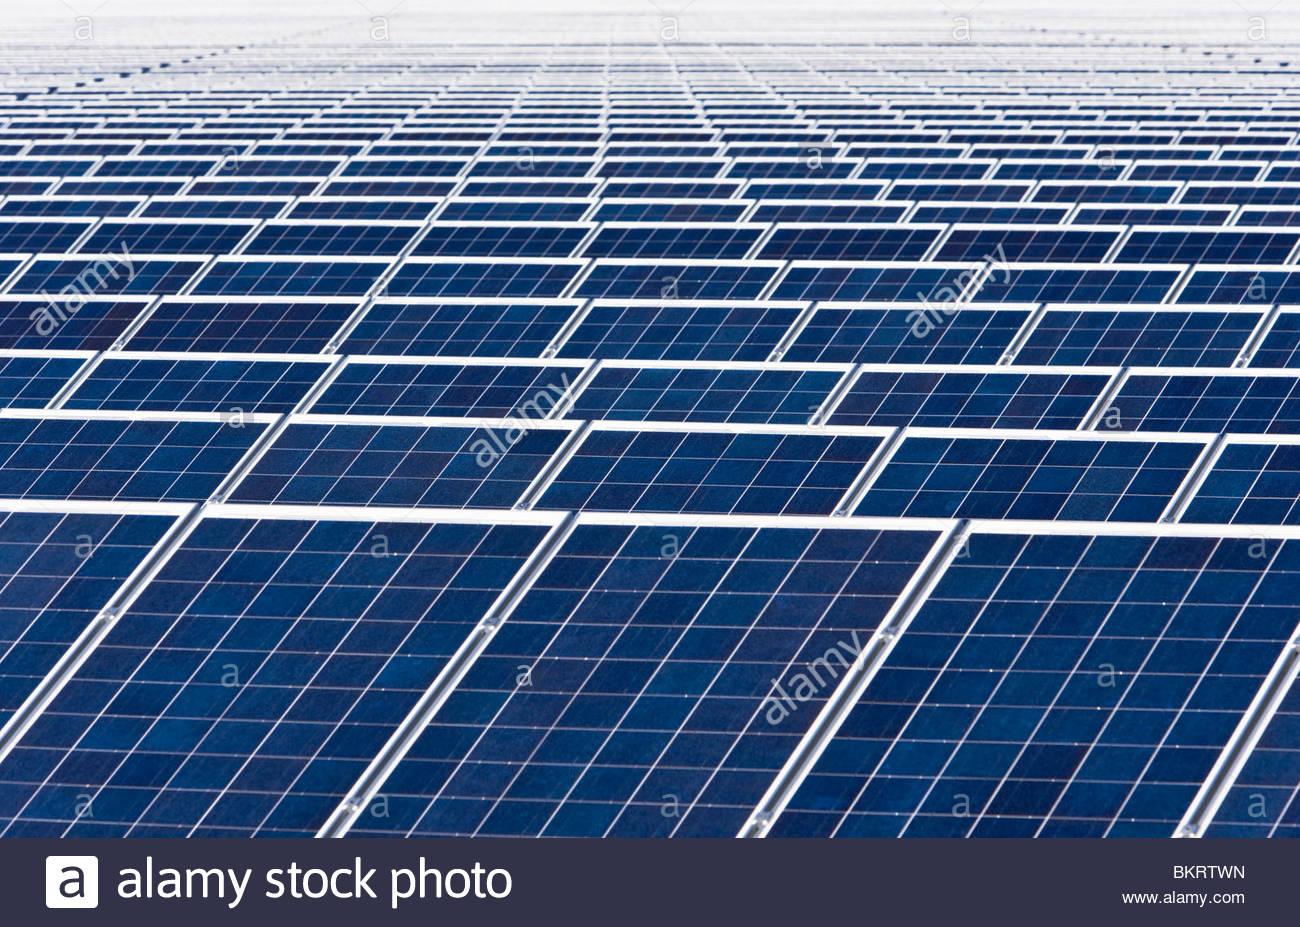 Solaranlagen Köln solarenergie anlage solar panel umwelttechnik photovoltaik array